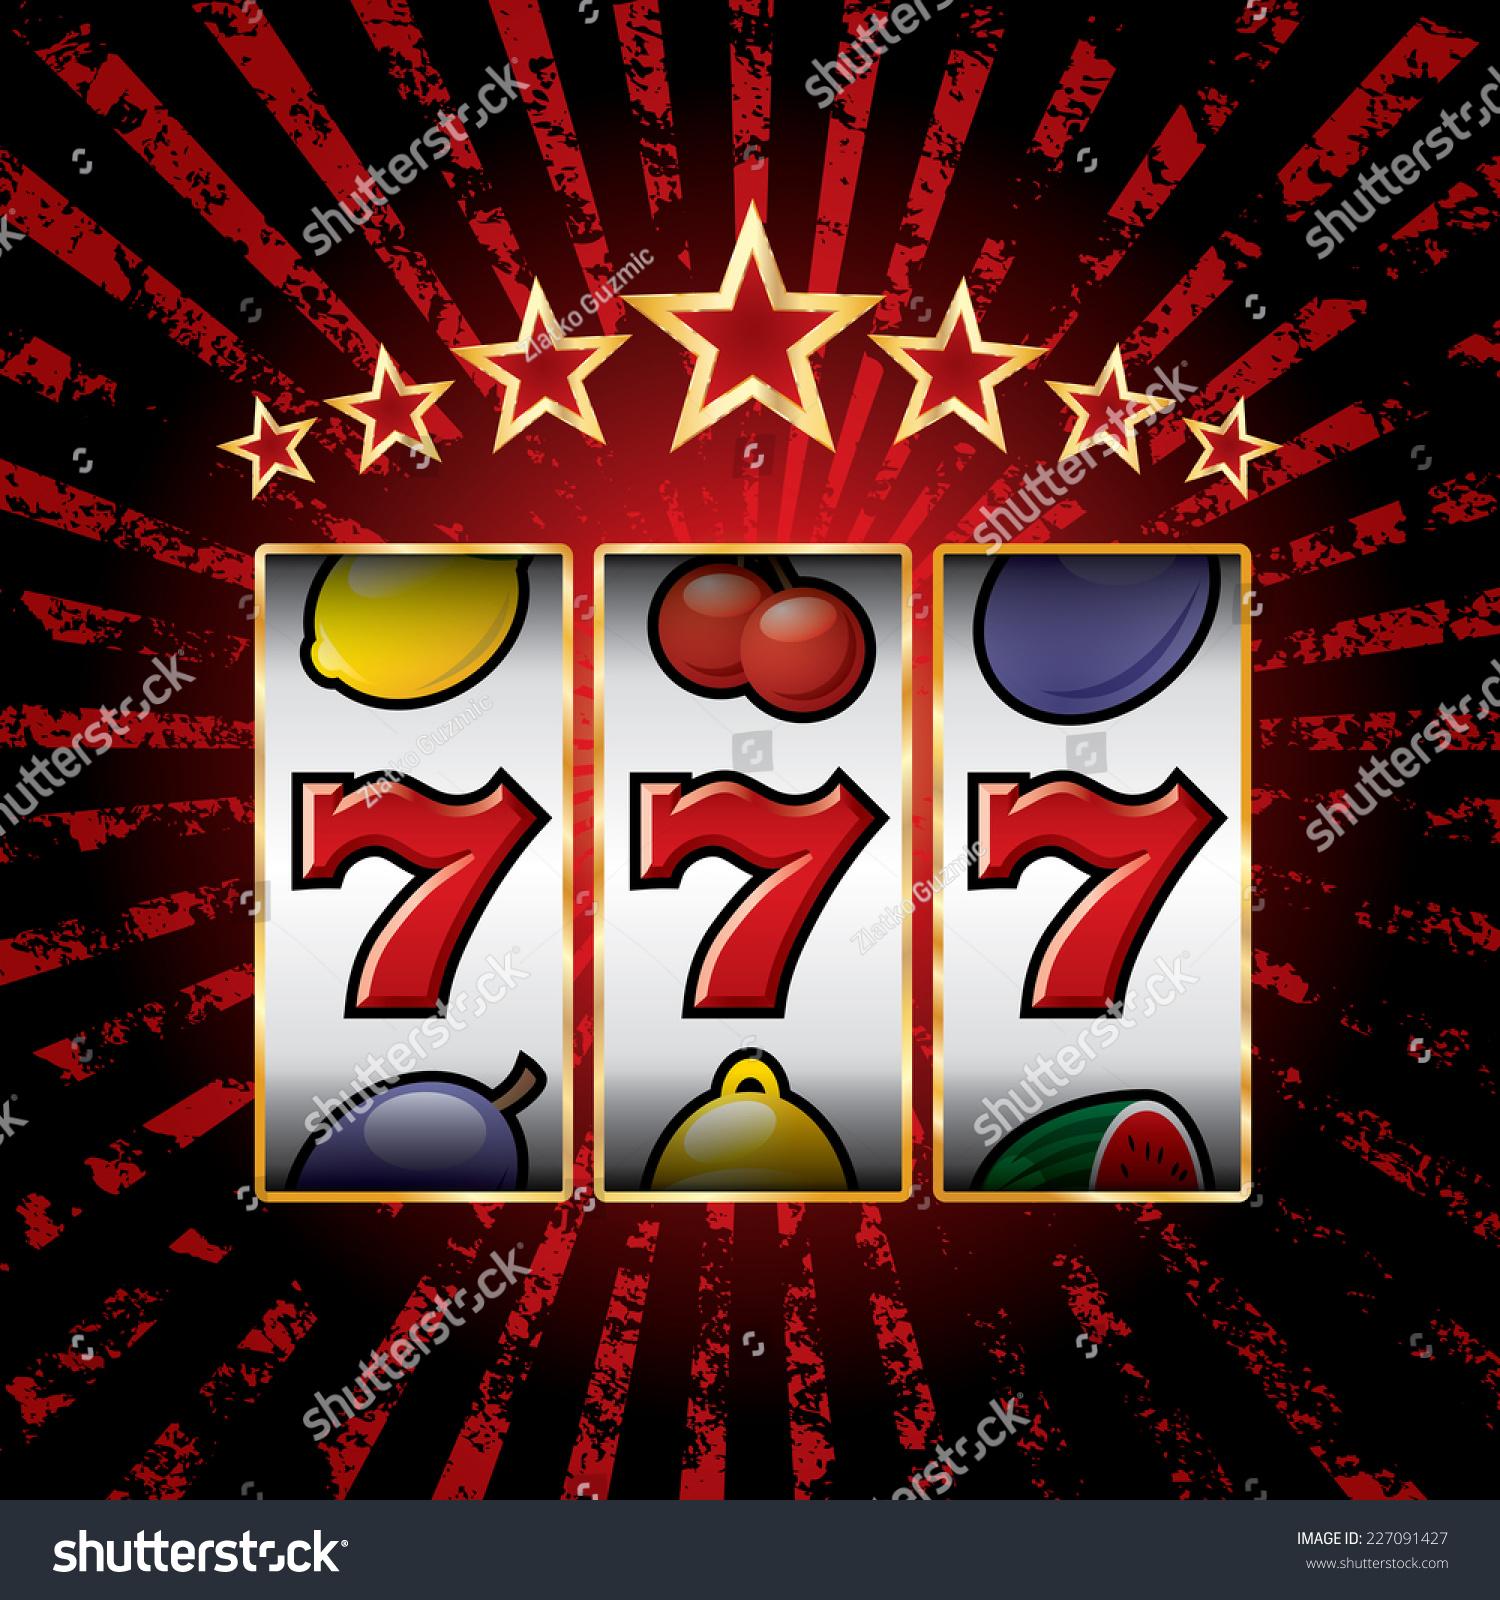 online casino norsk online jackpot games